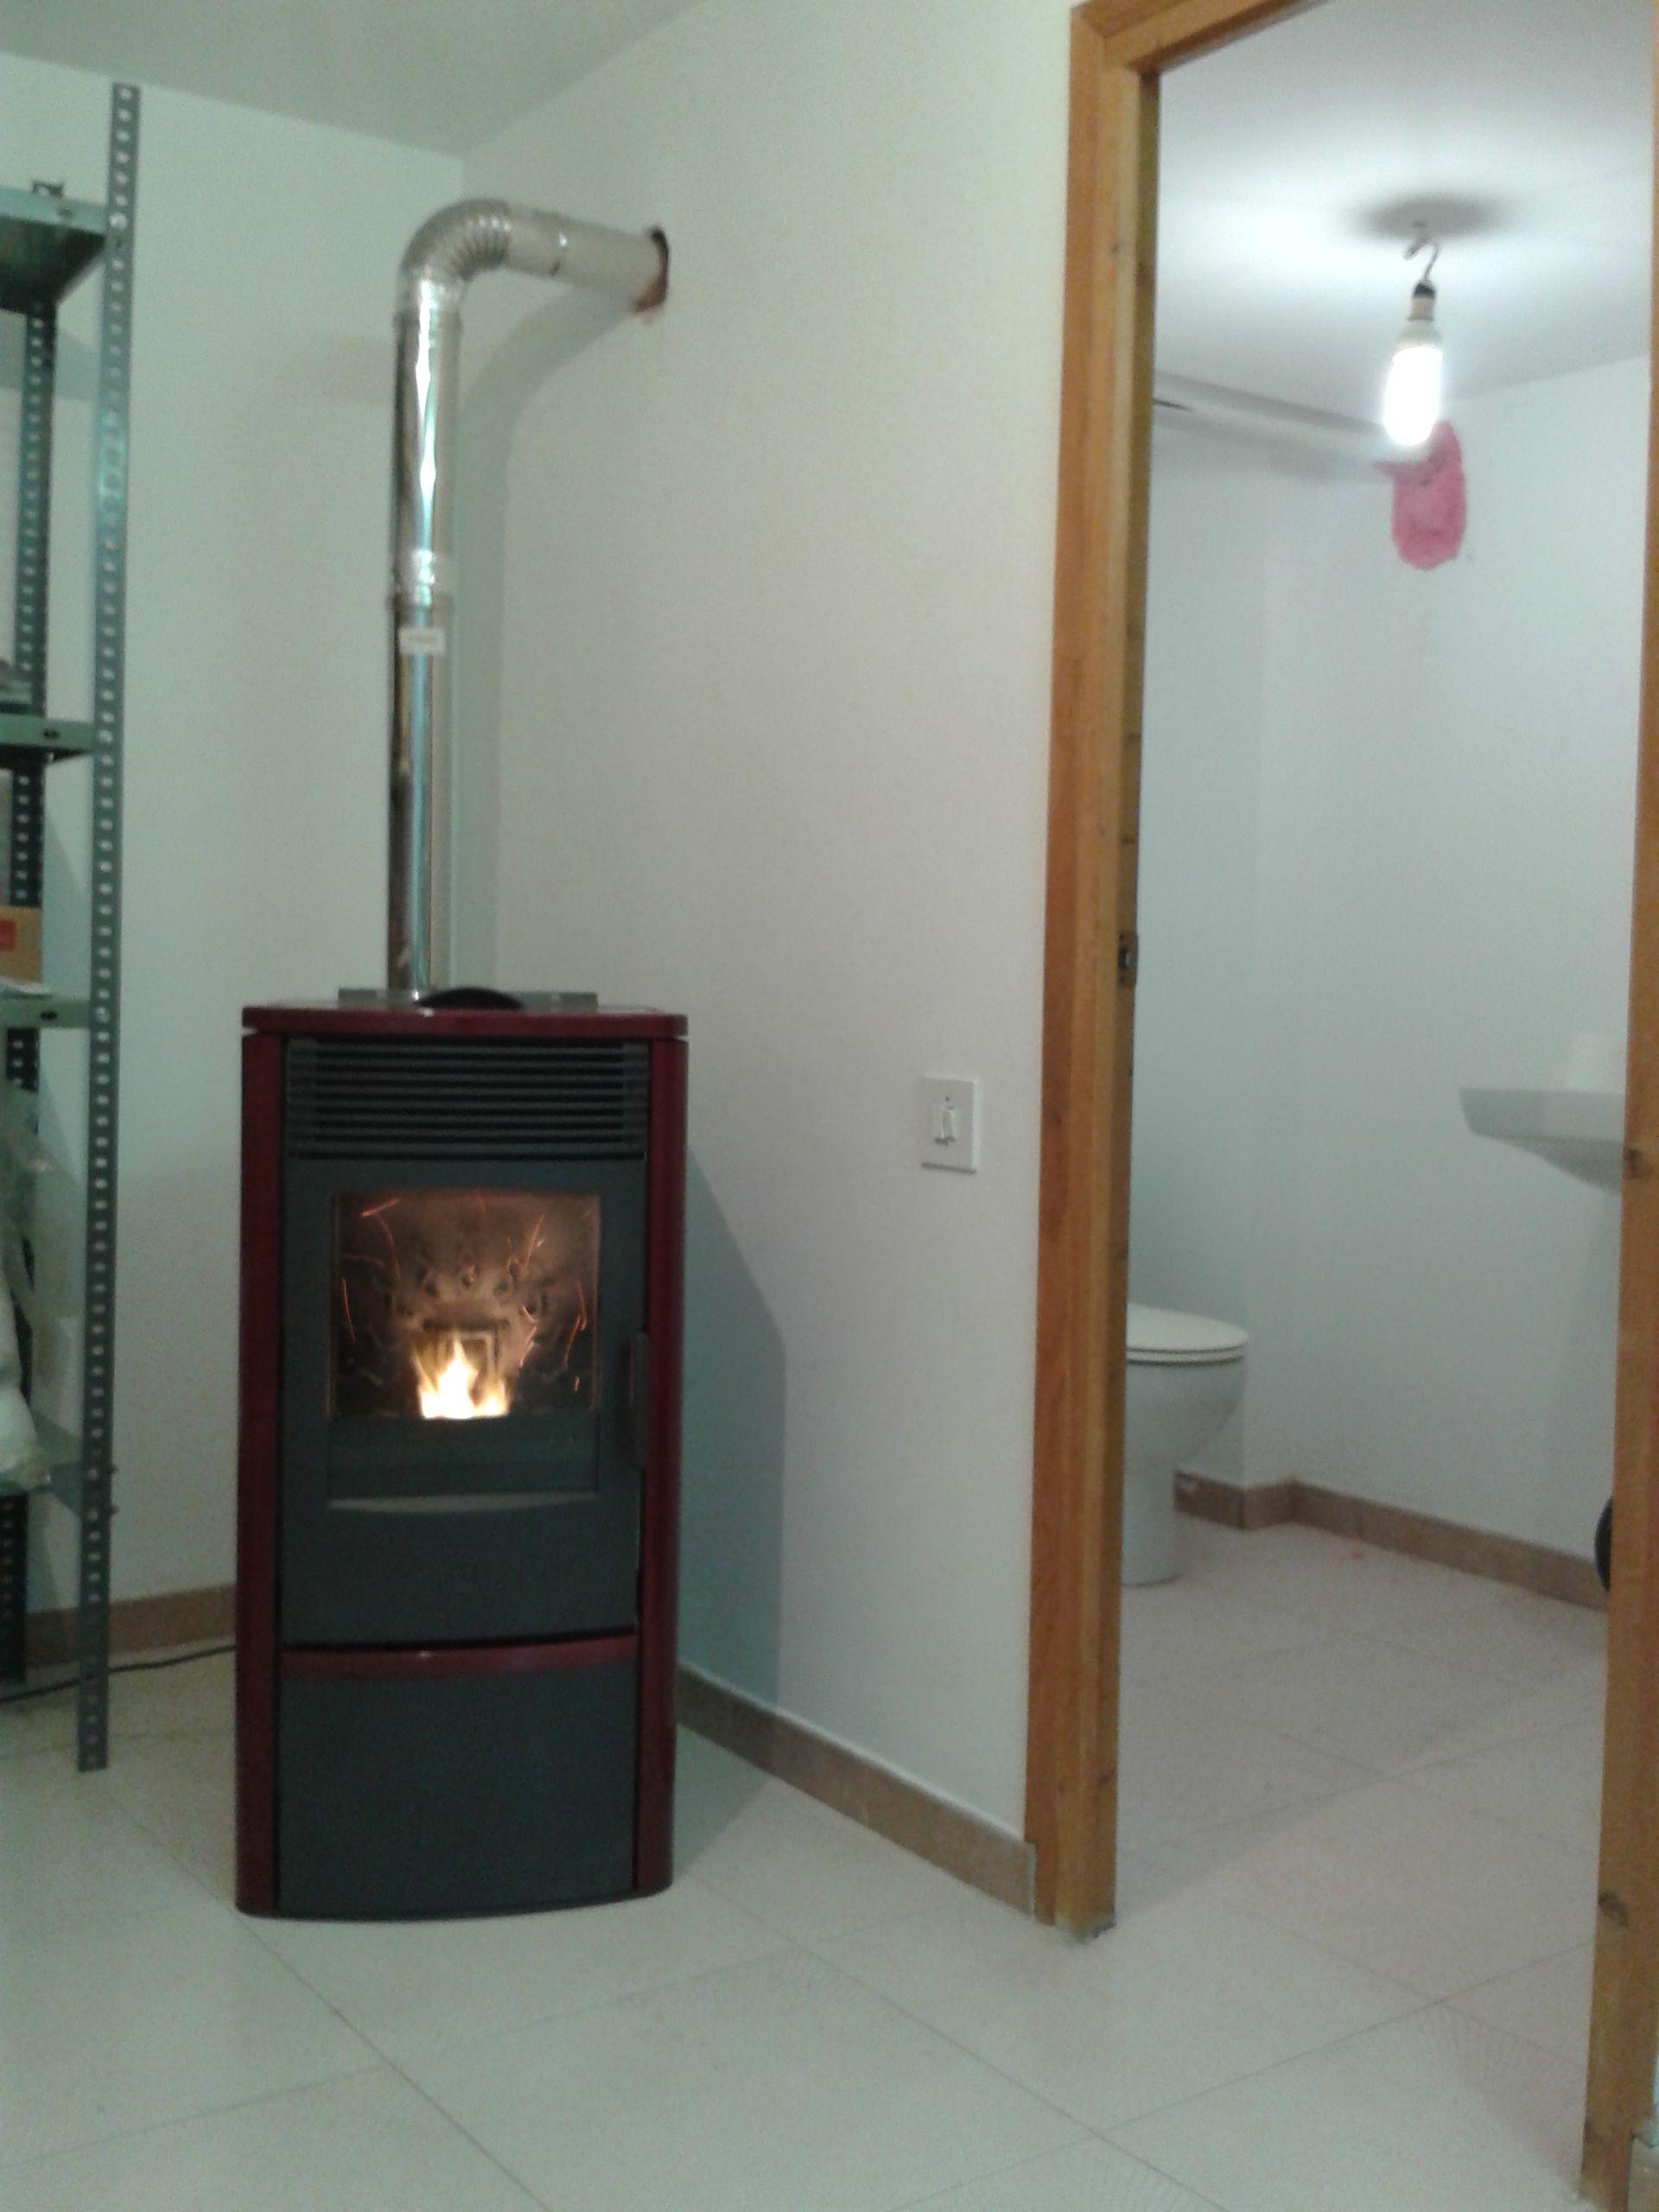 Estufa de pellet edilkamin seven burdeos instalaciones for Caldera de pellets para radiadores